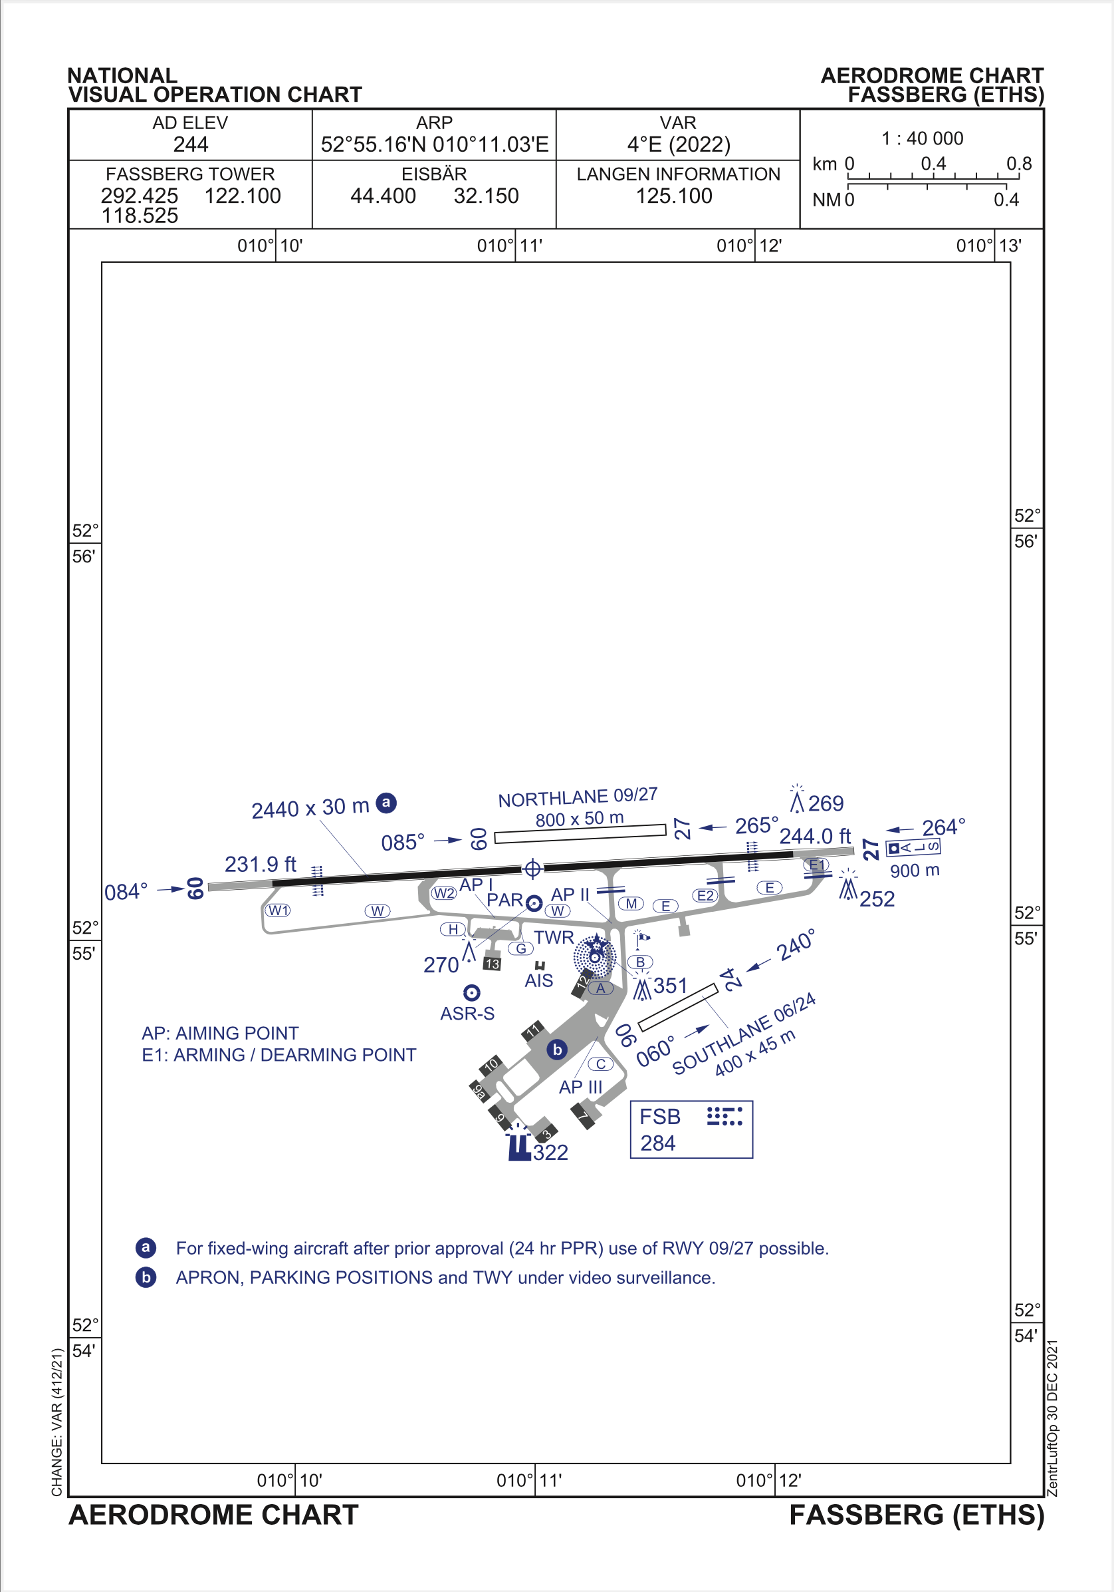 ETHS - Visual Operation Chart - AD